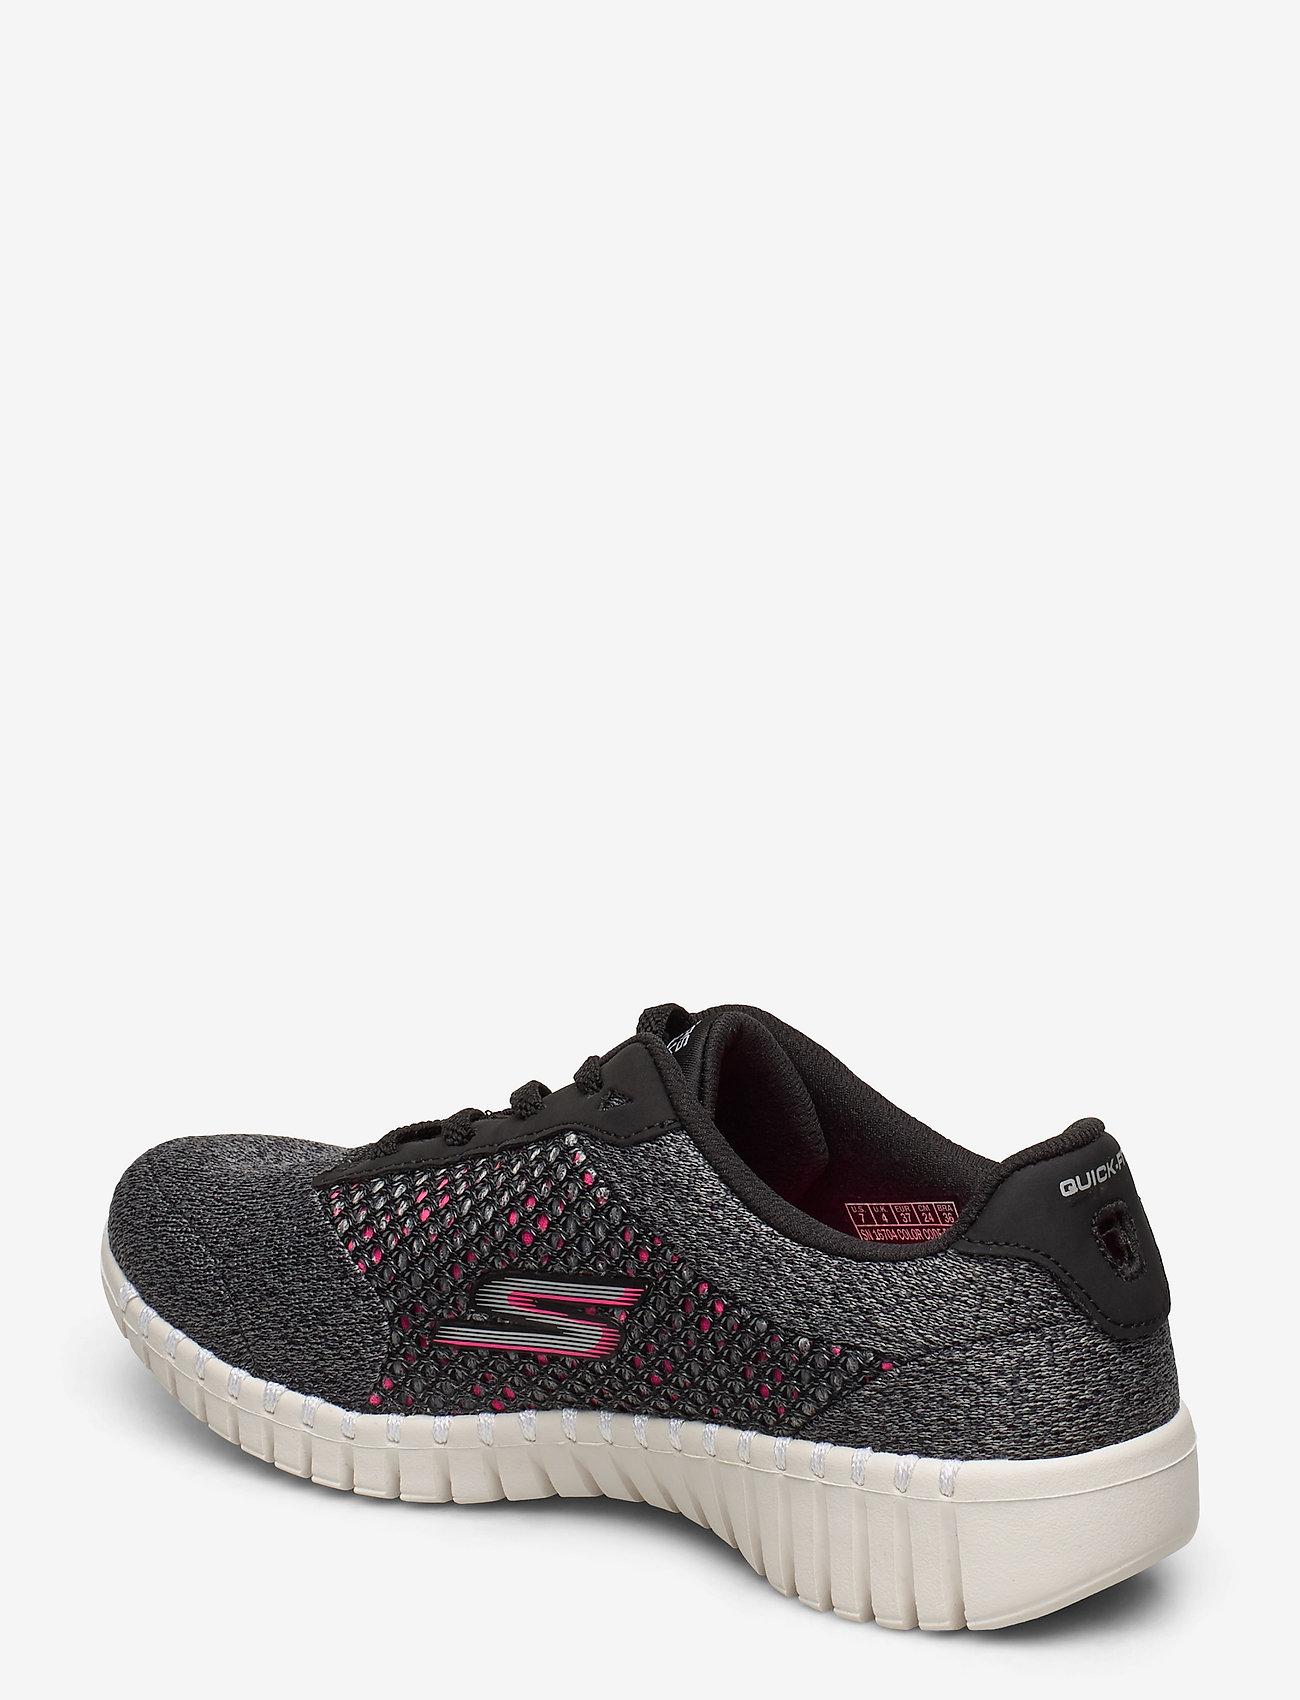 Womens Go Walk (Bkhp Black Hot Pink) - Skechers